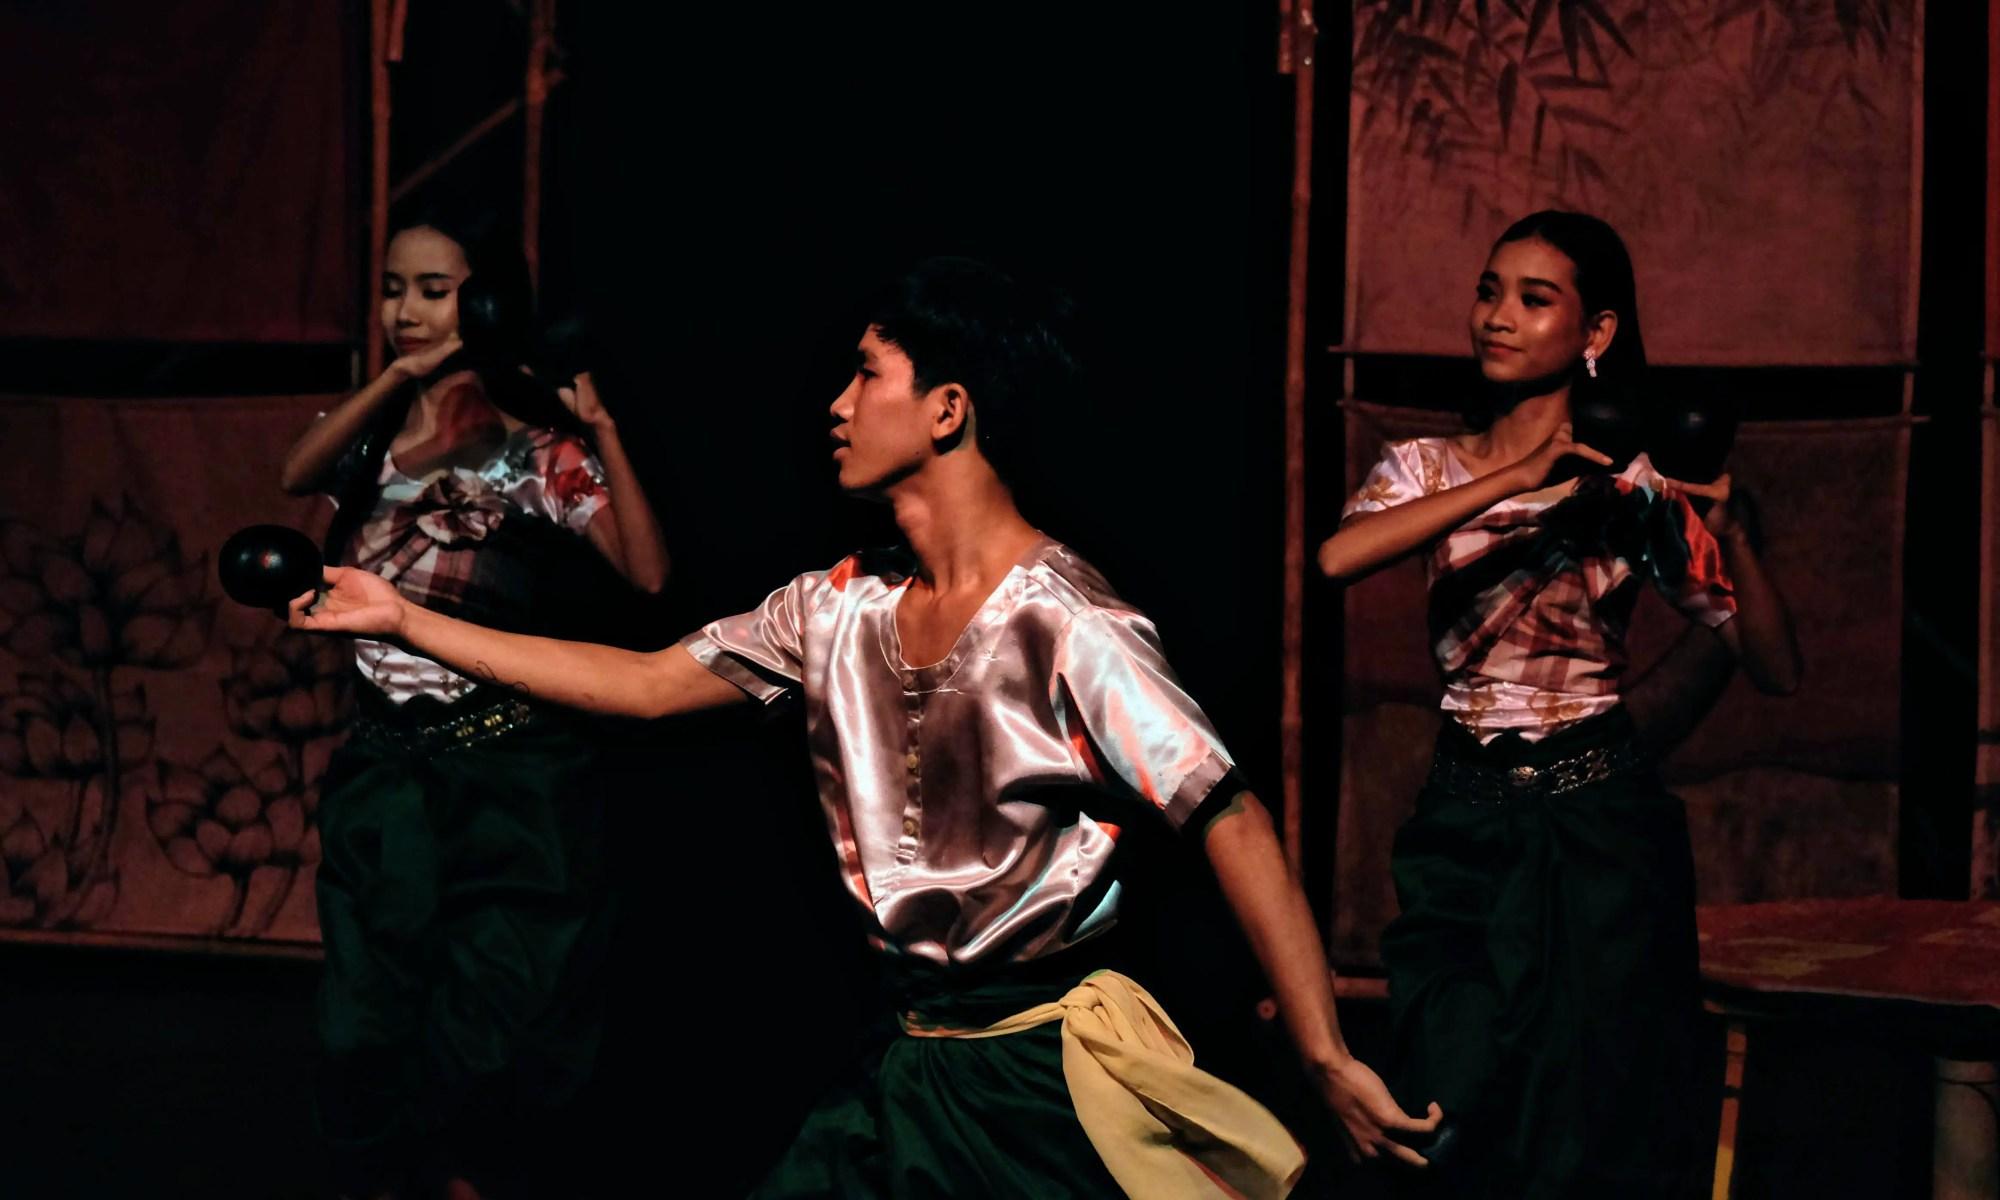 Performers at Phare Circus, Battambang, Cambodia